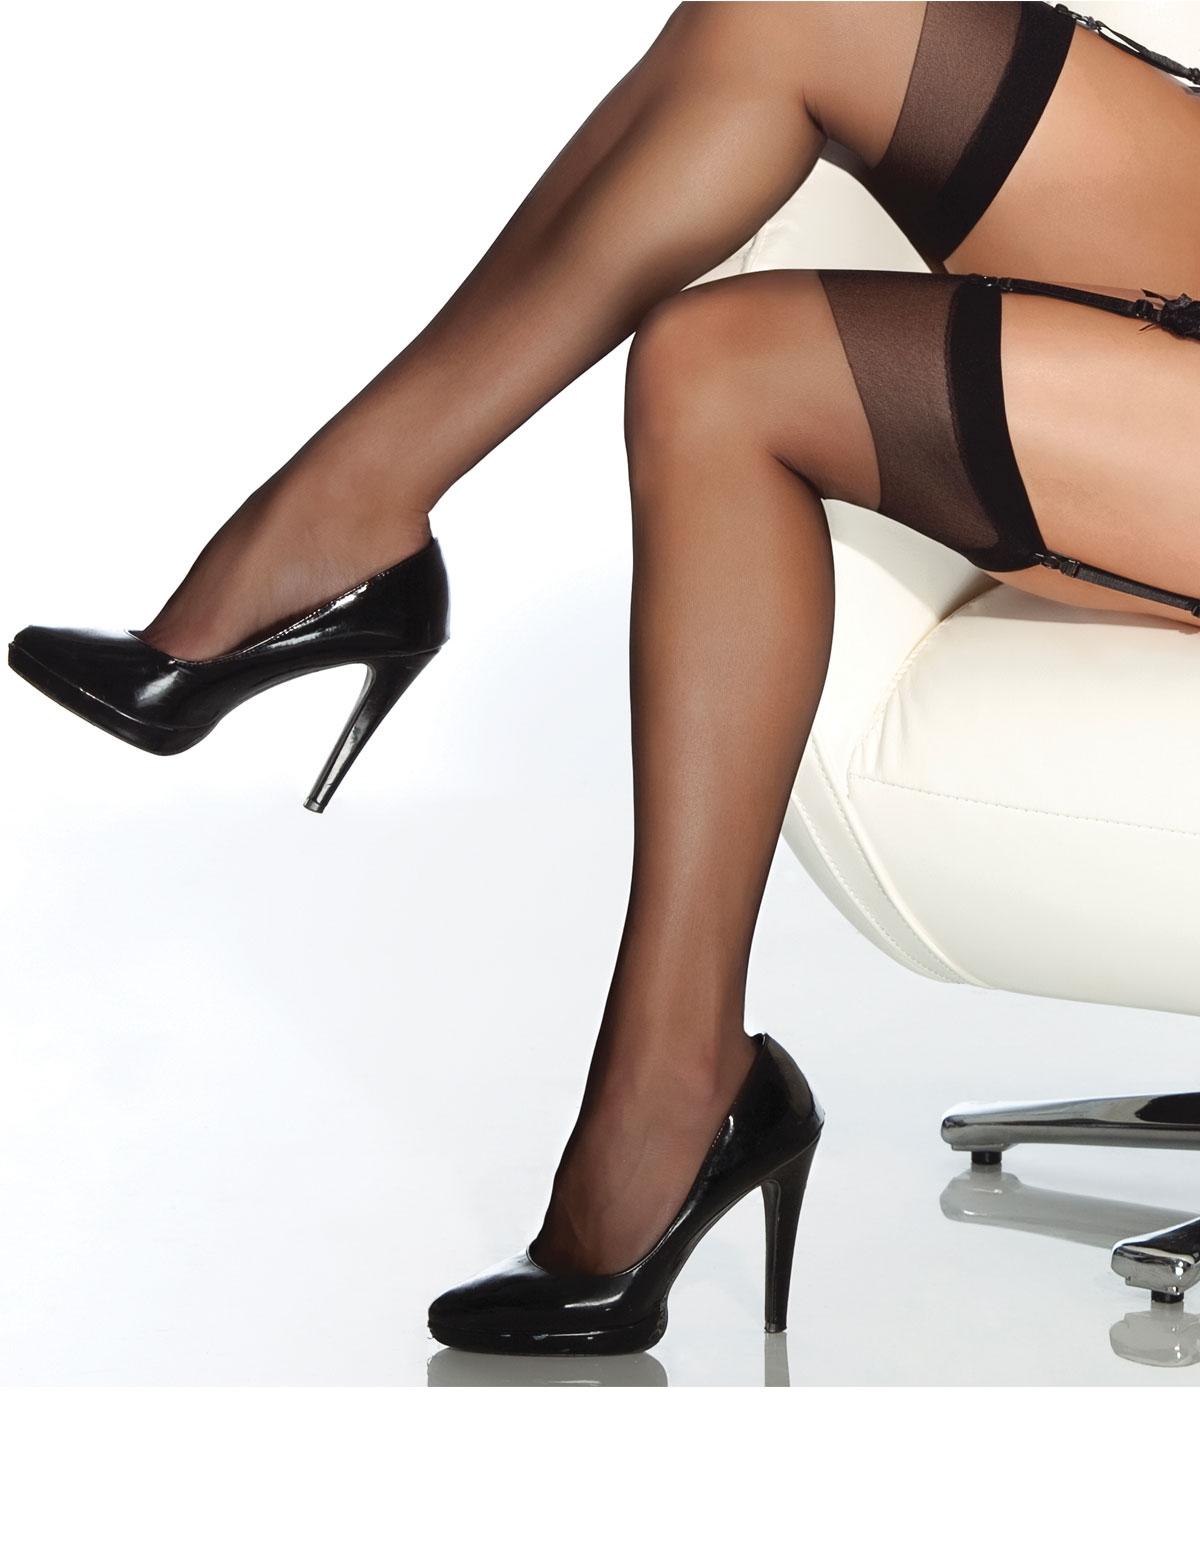 Sheer Stockings - Reg & Plus